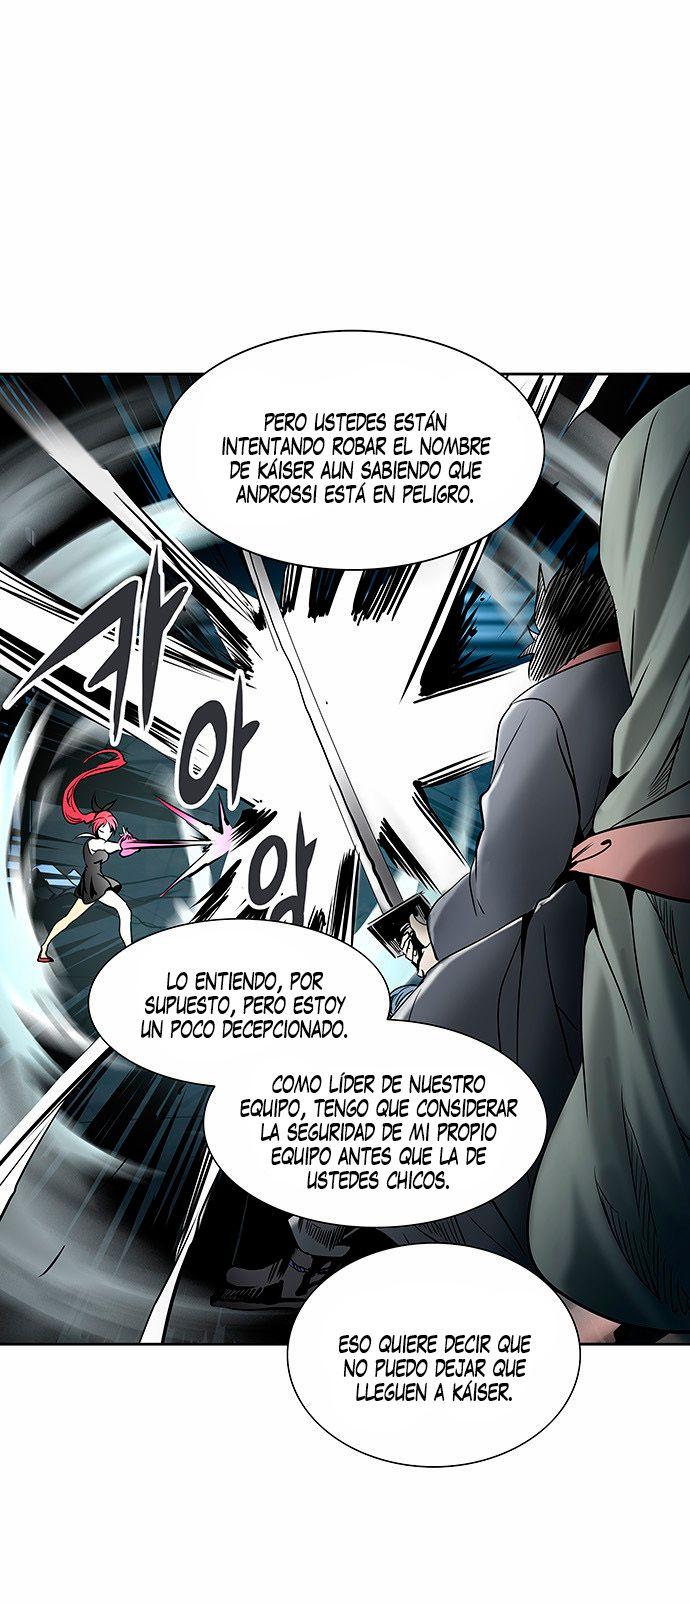 https://c5.ninemanga.com/es_manga/pic2/21/149/501713/f8bbf9cacef0458f3573ebcb5bba7a8f.jpg Page 33